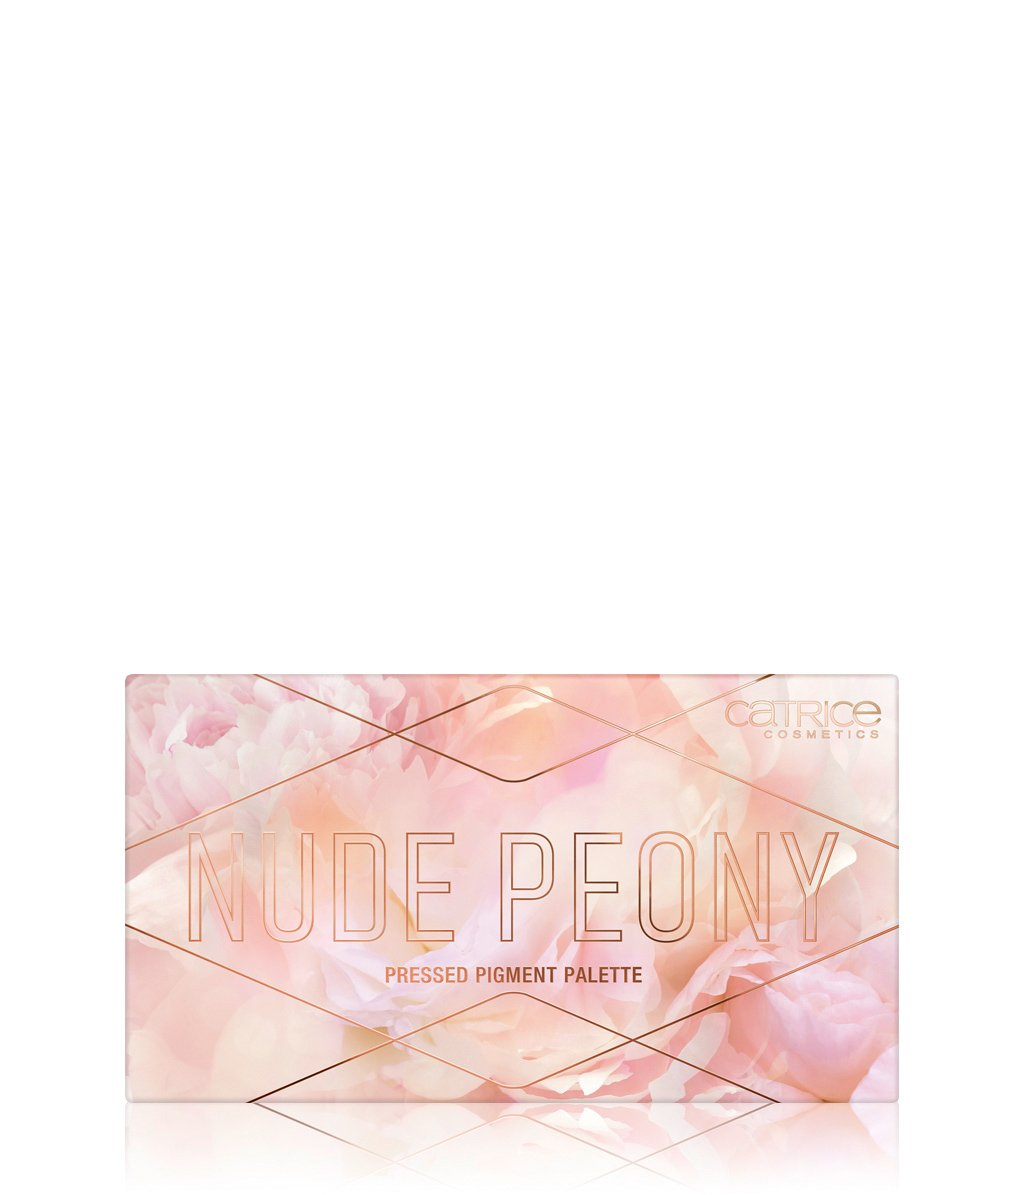 Nude Peony Pressed Pigment Palette ♥ CATRICE COSMETICS